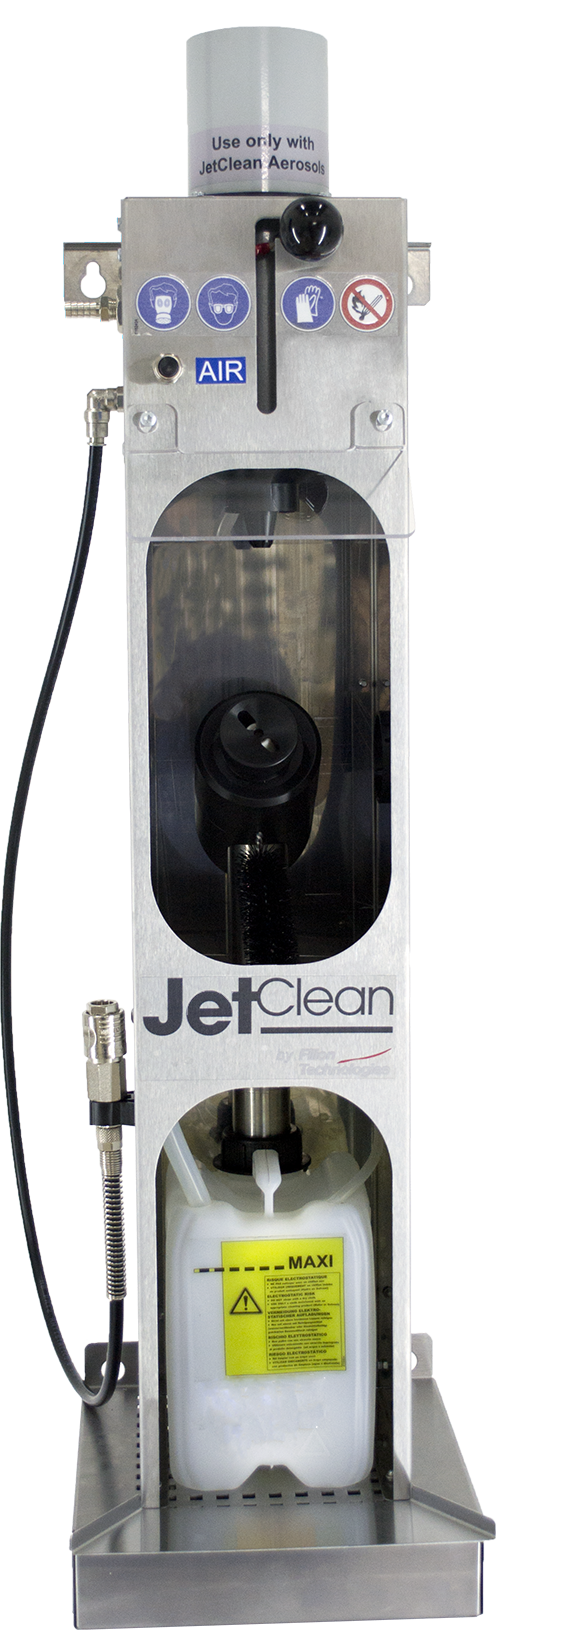 jet clean faceAV